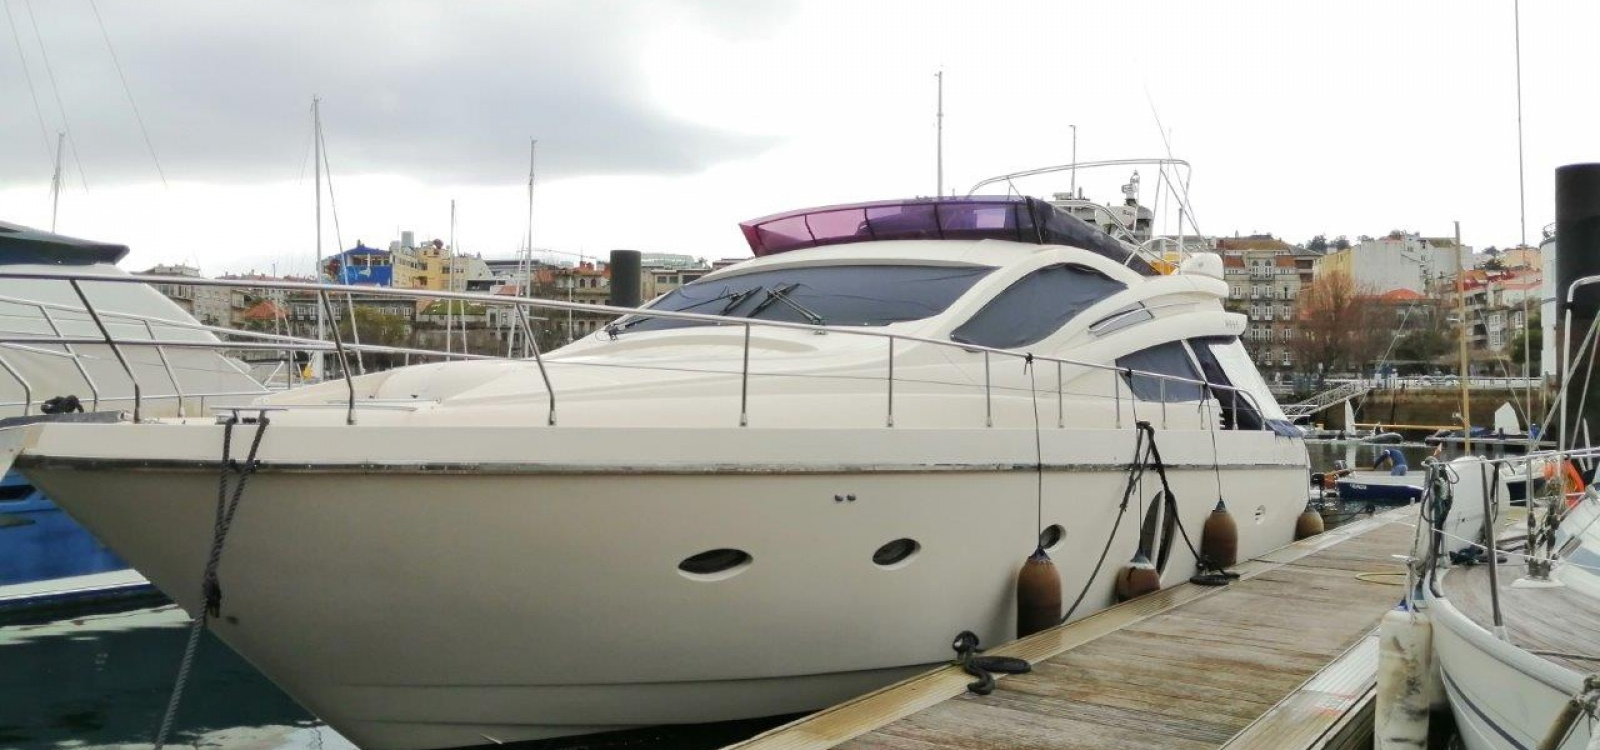 Vigo,Pontevedra,España,3 LavabosLavabos,Barco a motor,2096